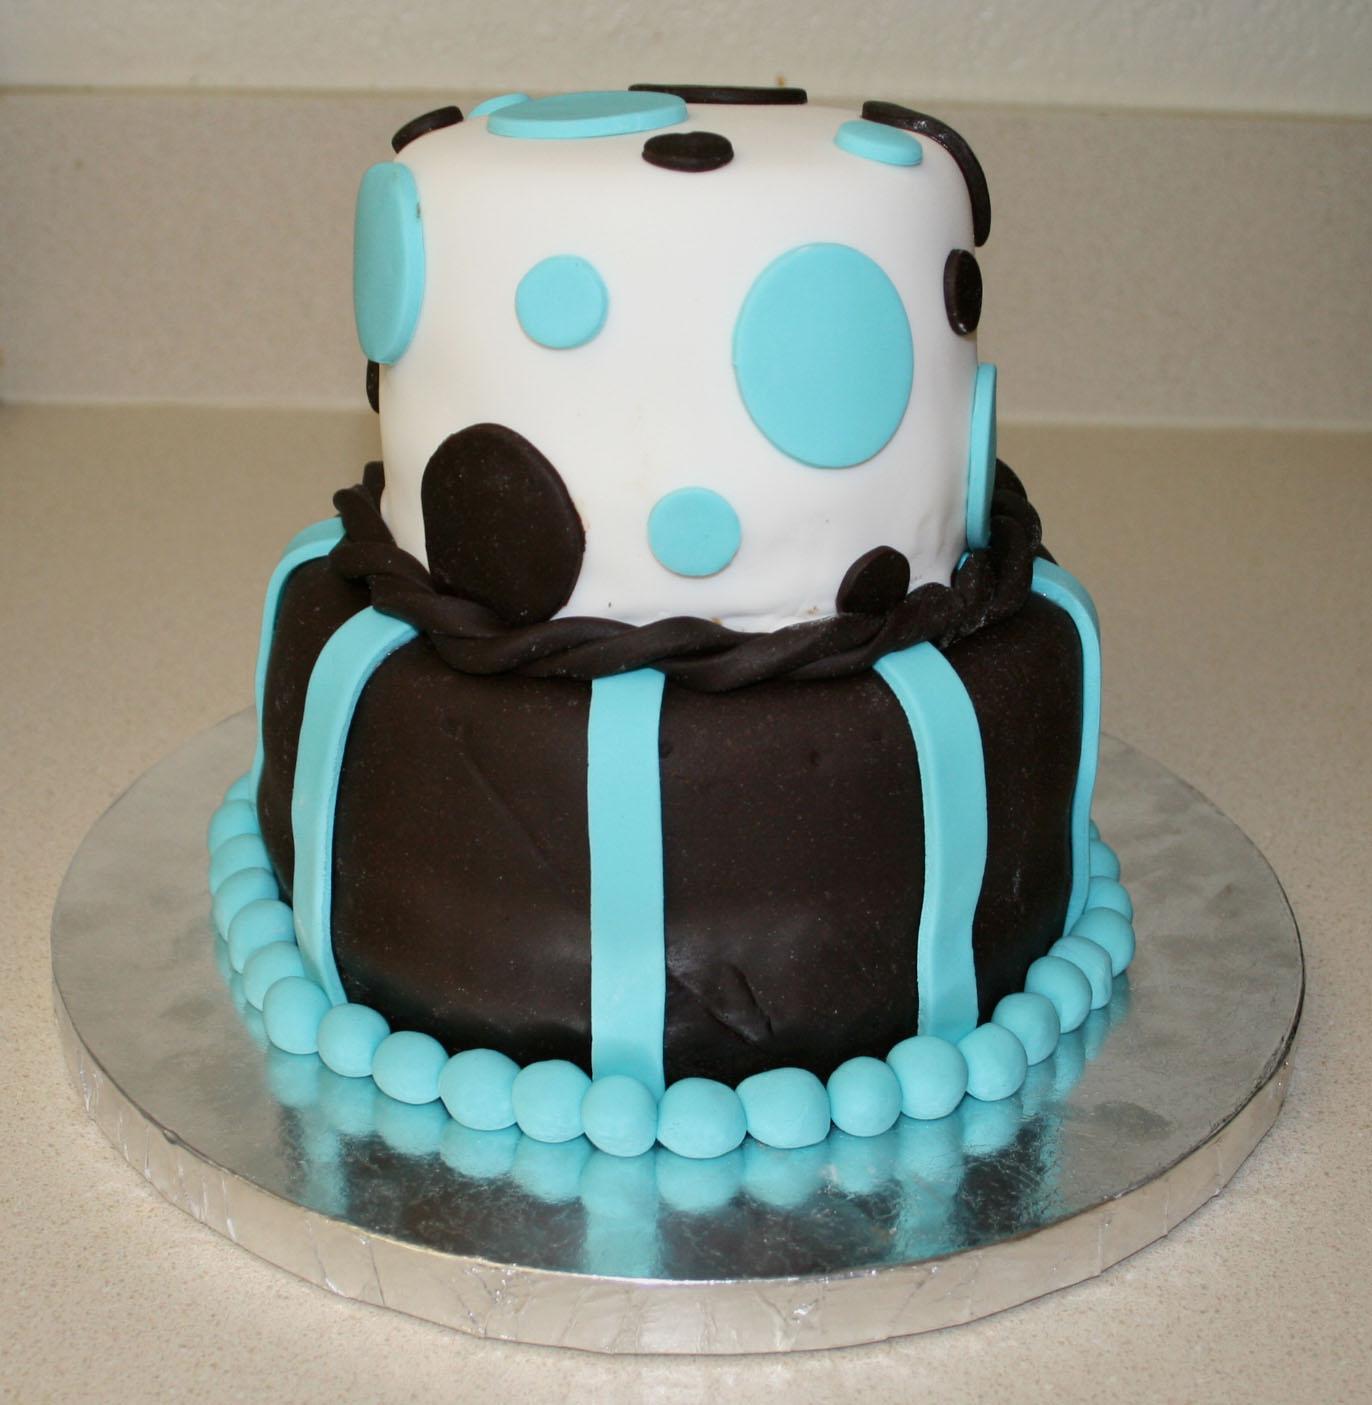 Tremendous 11 Funny Fondant Cakes Photo Fondant Birthday Cake Ideas Funny Birthday Cards Online Elaedamsfinfo